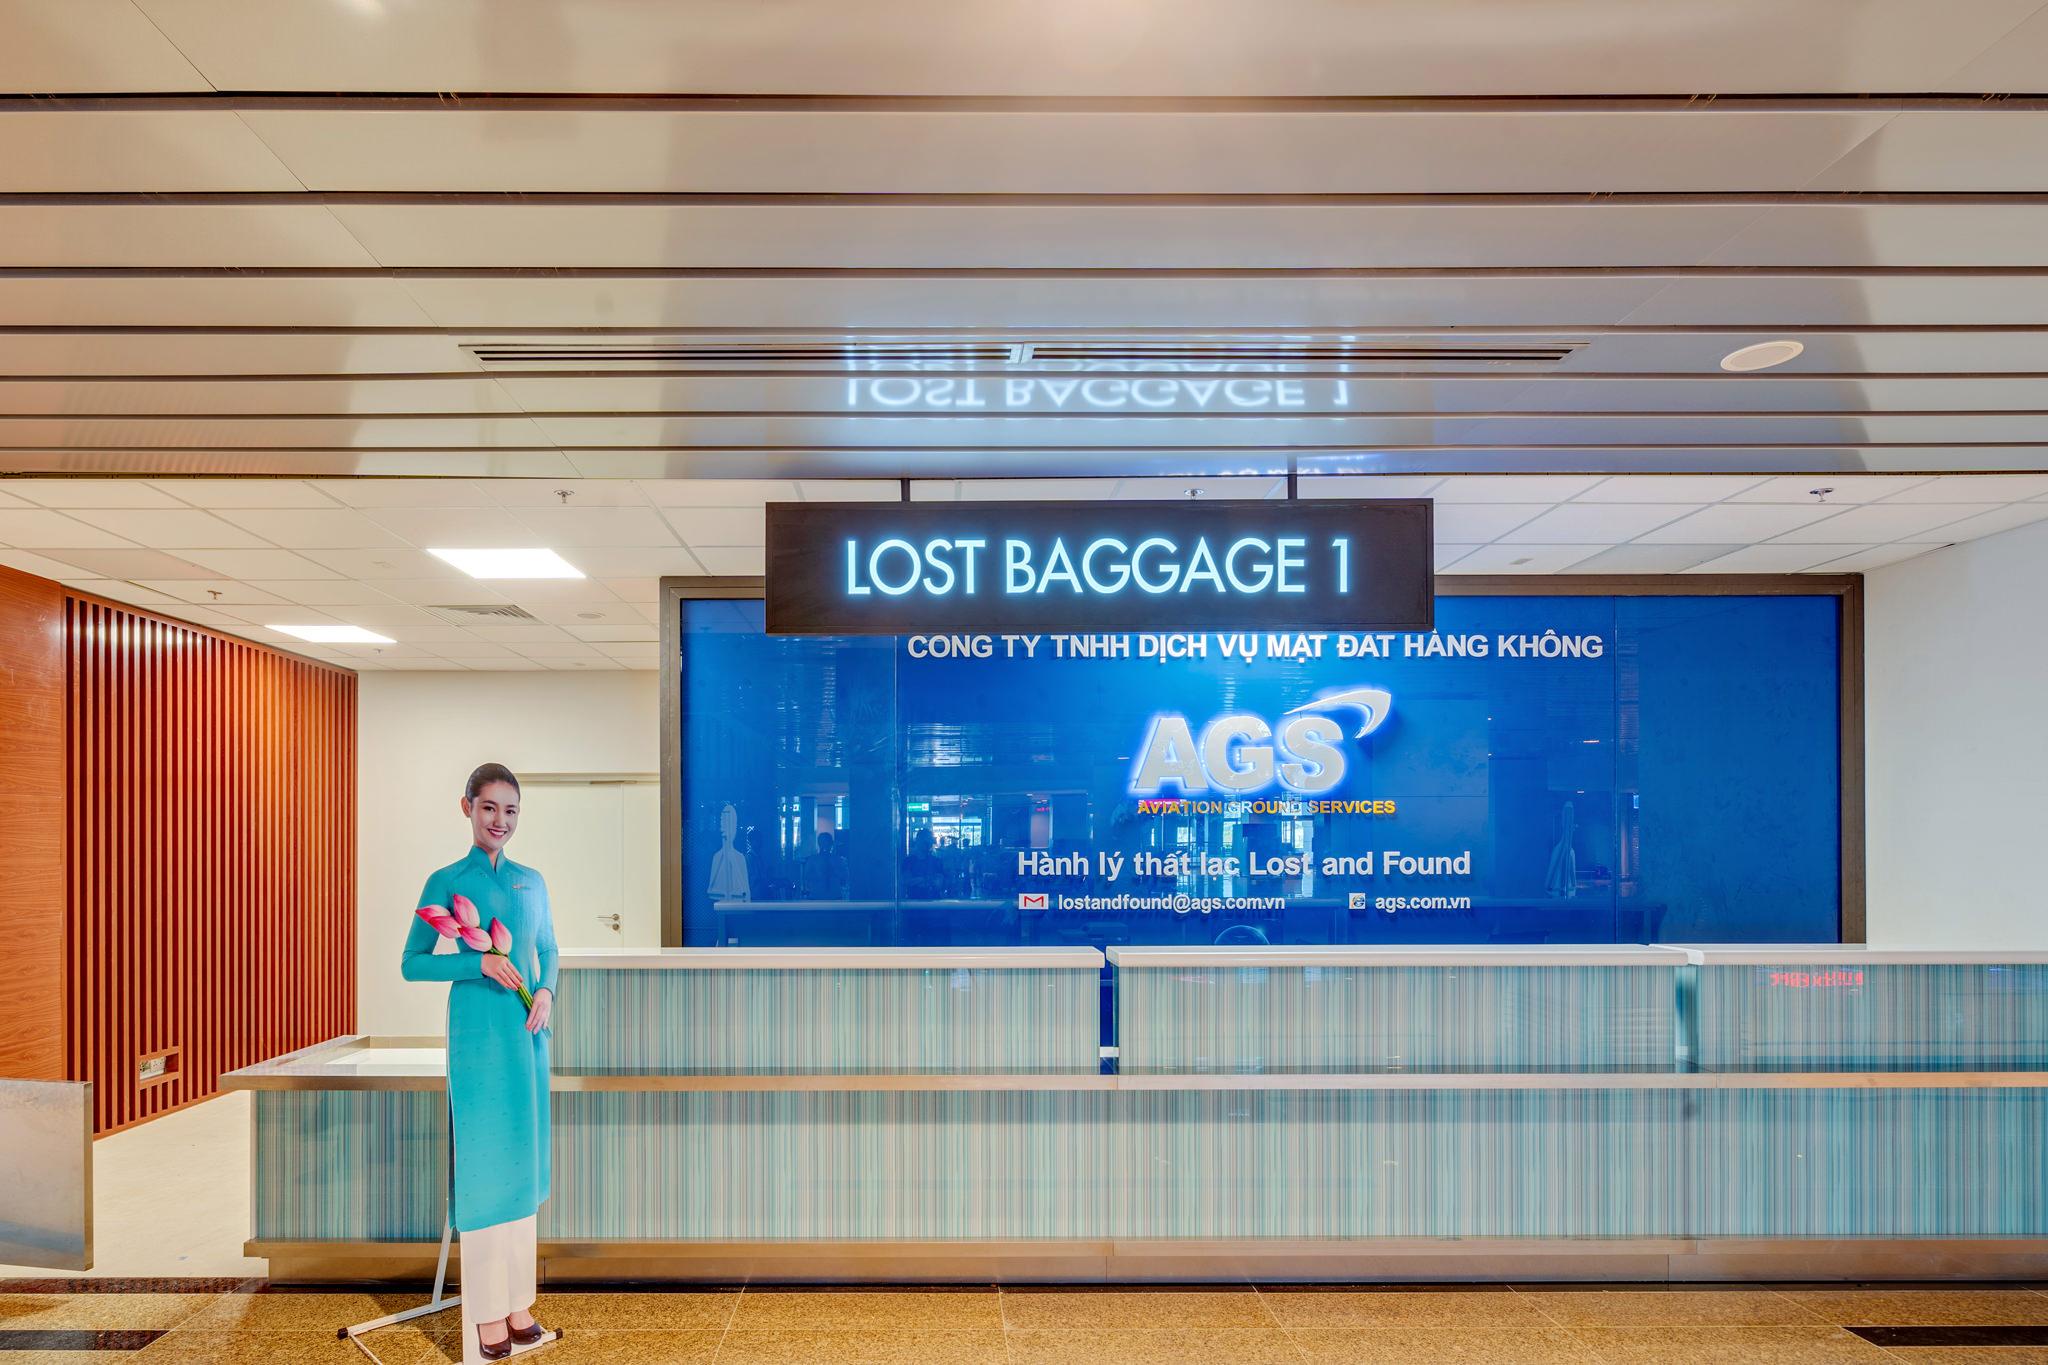 20180626 - Cam Ranh Airport - Architecture - 0129.jpg